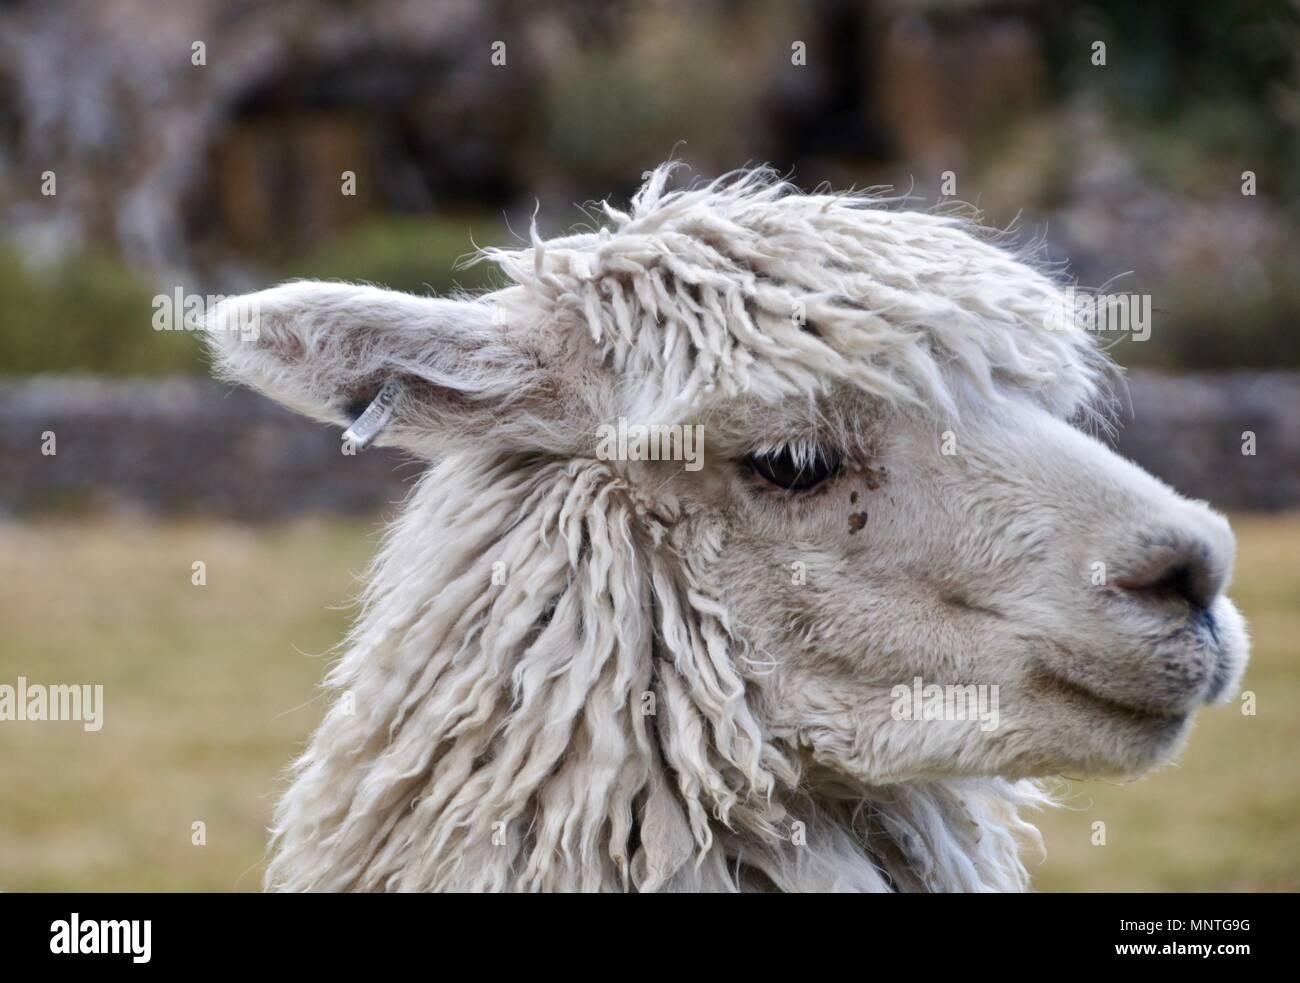 A llama enjoying the view - Stock Image